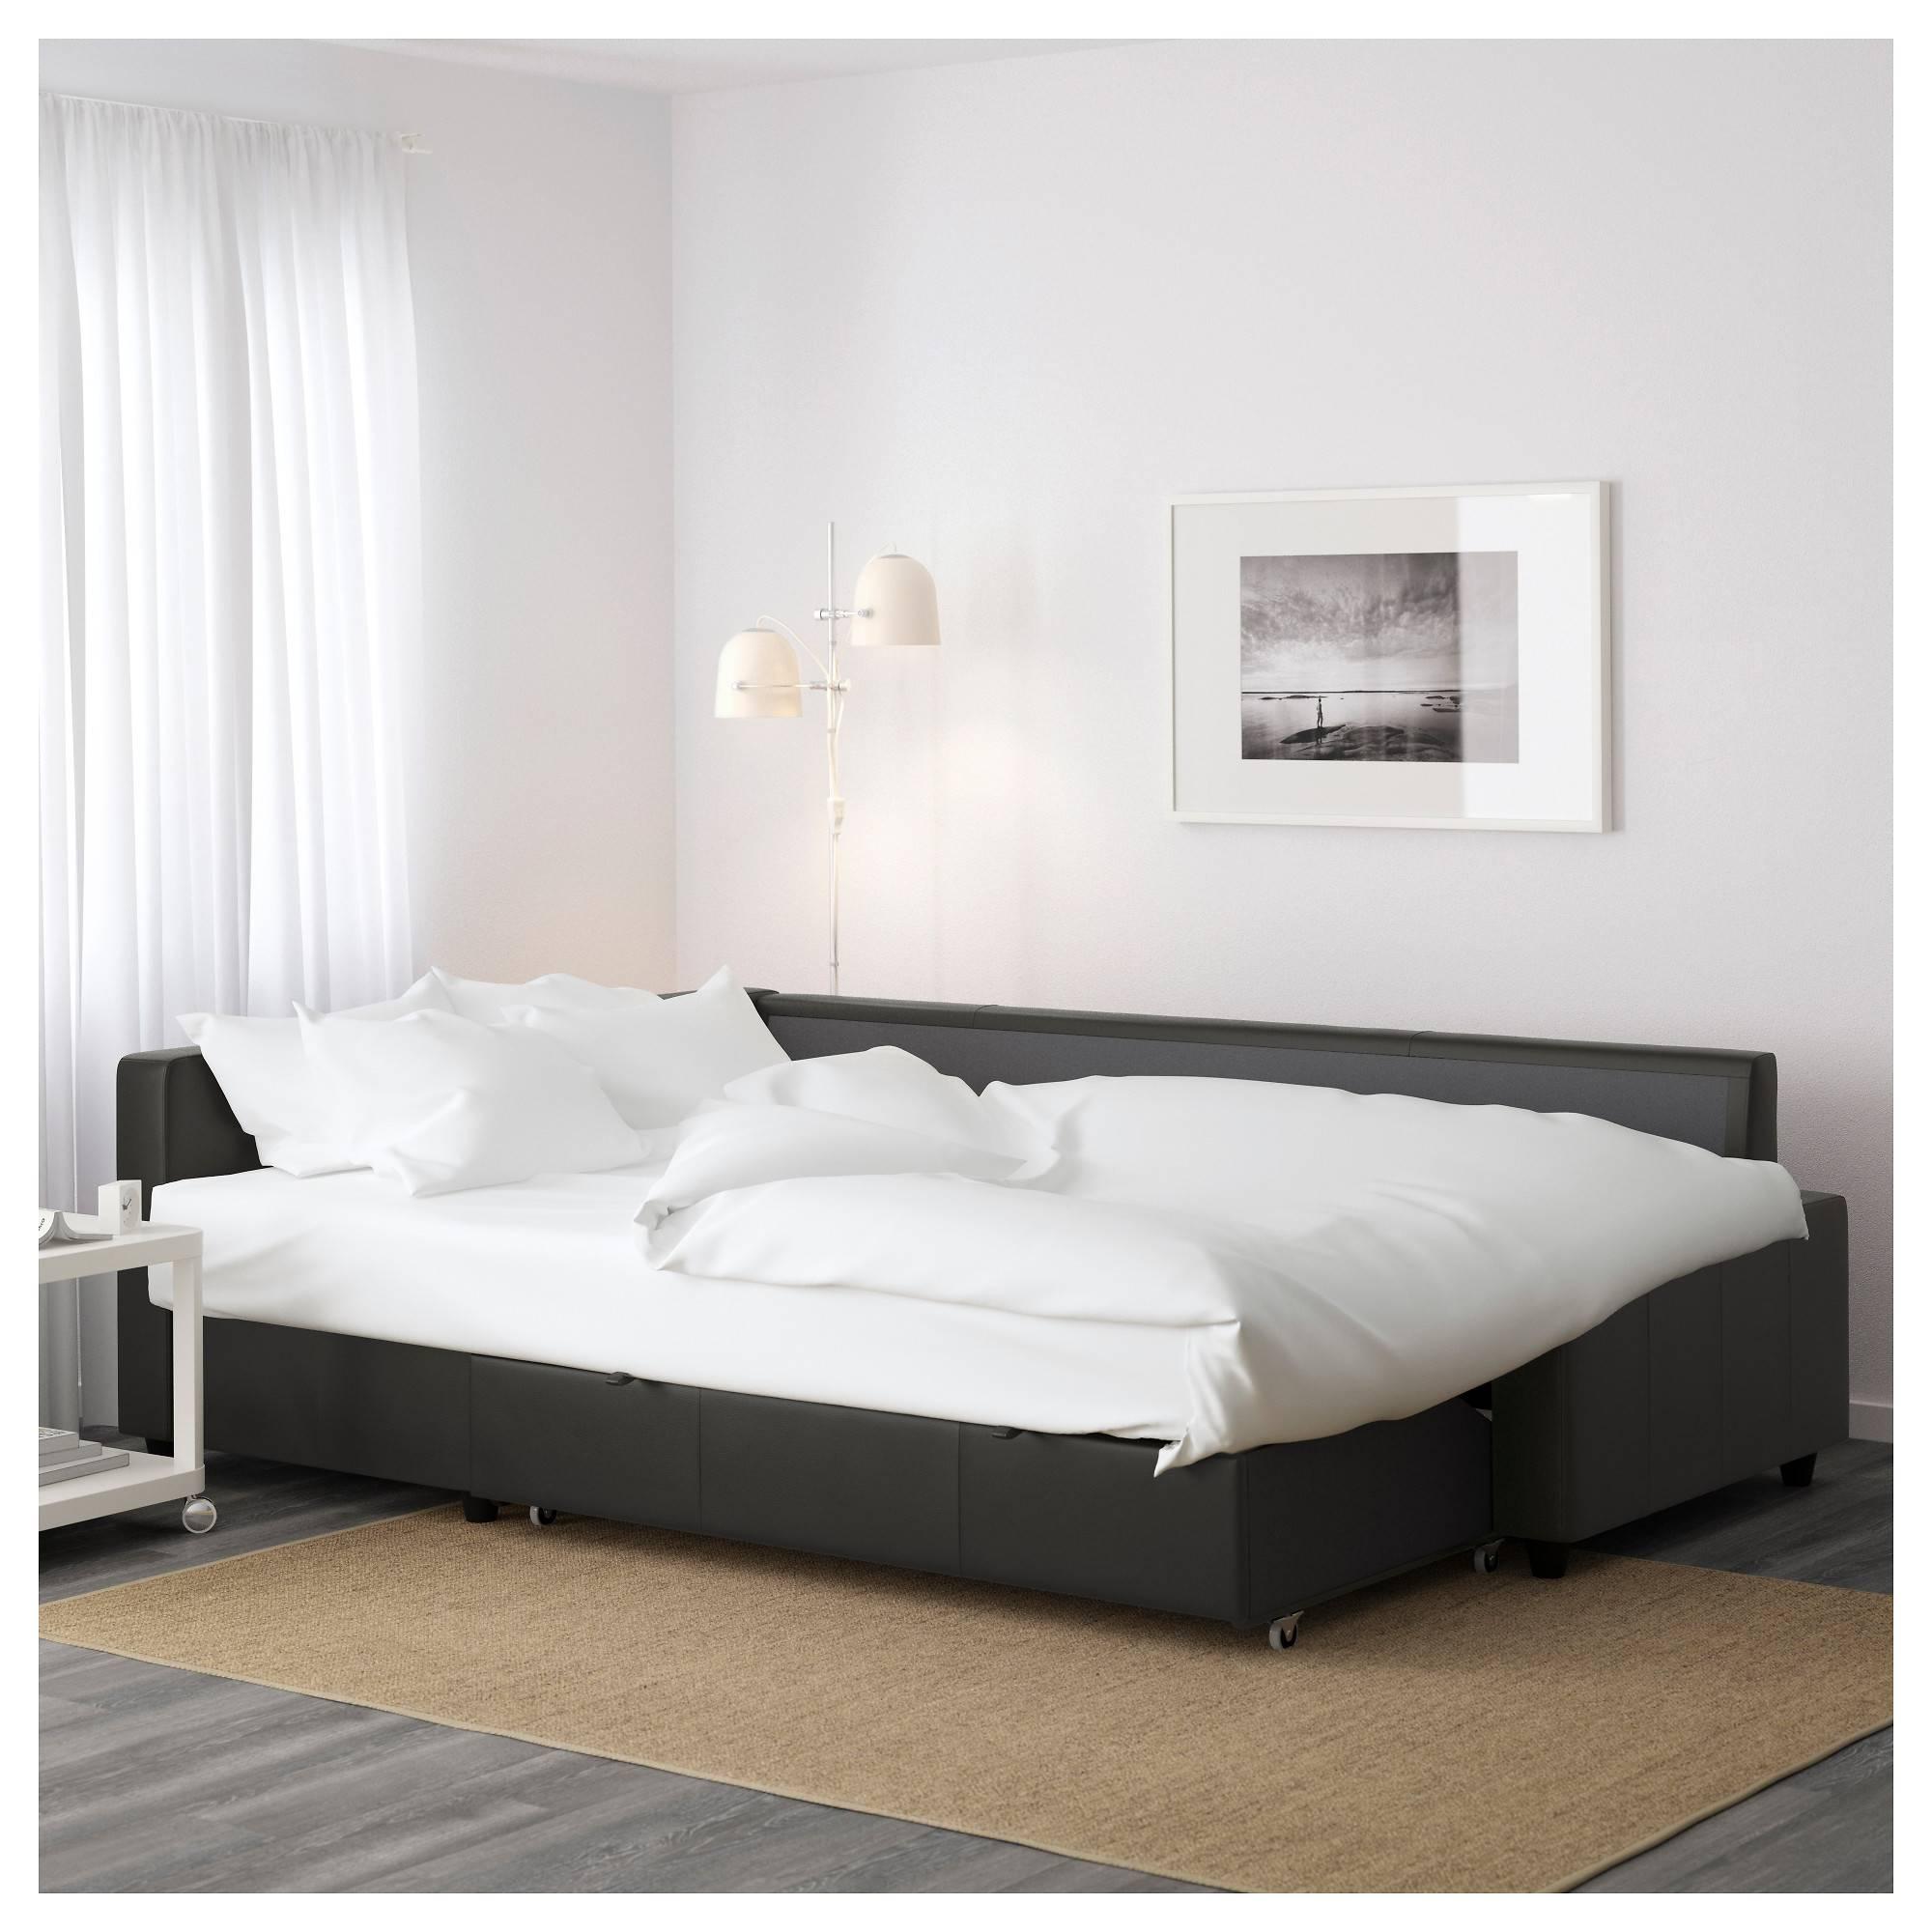 Friheten Sleeper Sectional,3 Seat W/storage - Skiftebo Dark Gray inside Storage Sofa Ikea (Image 11 of 25)